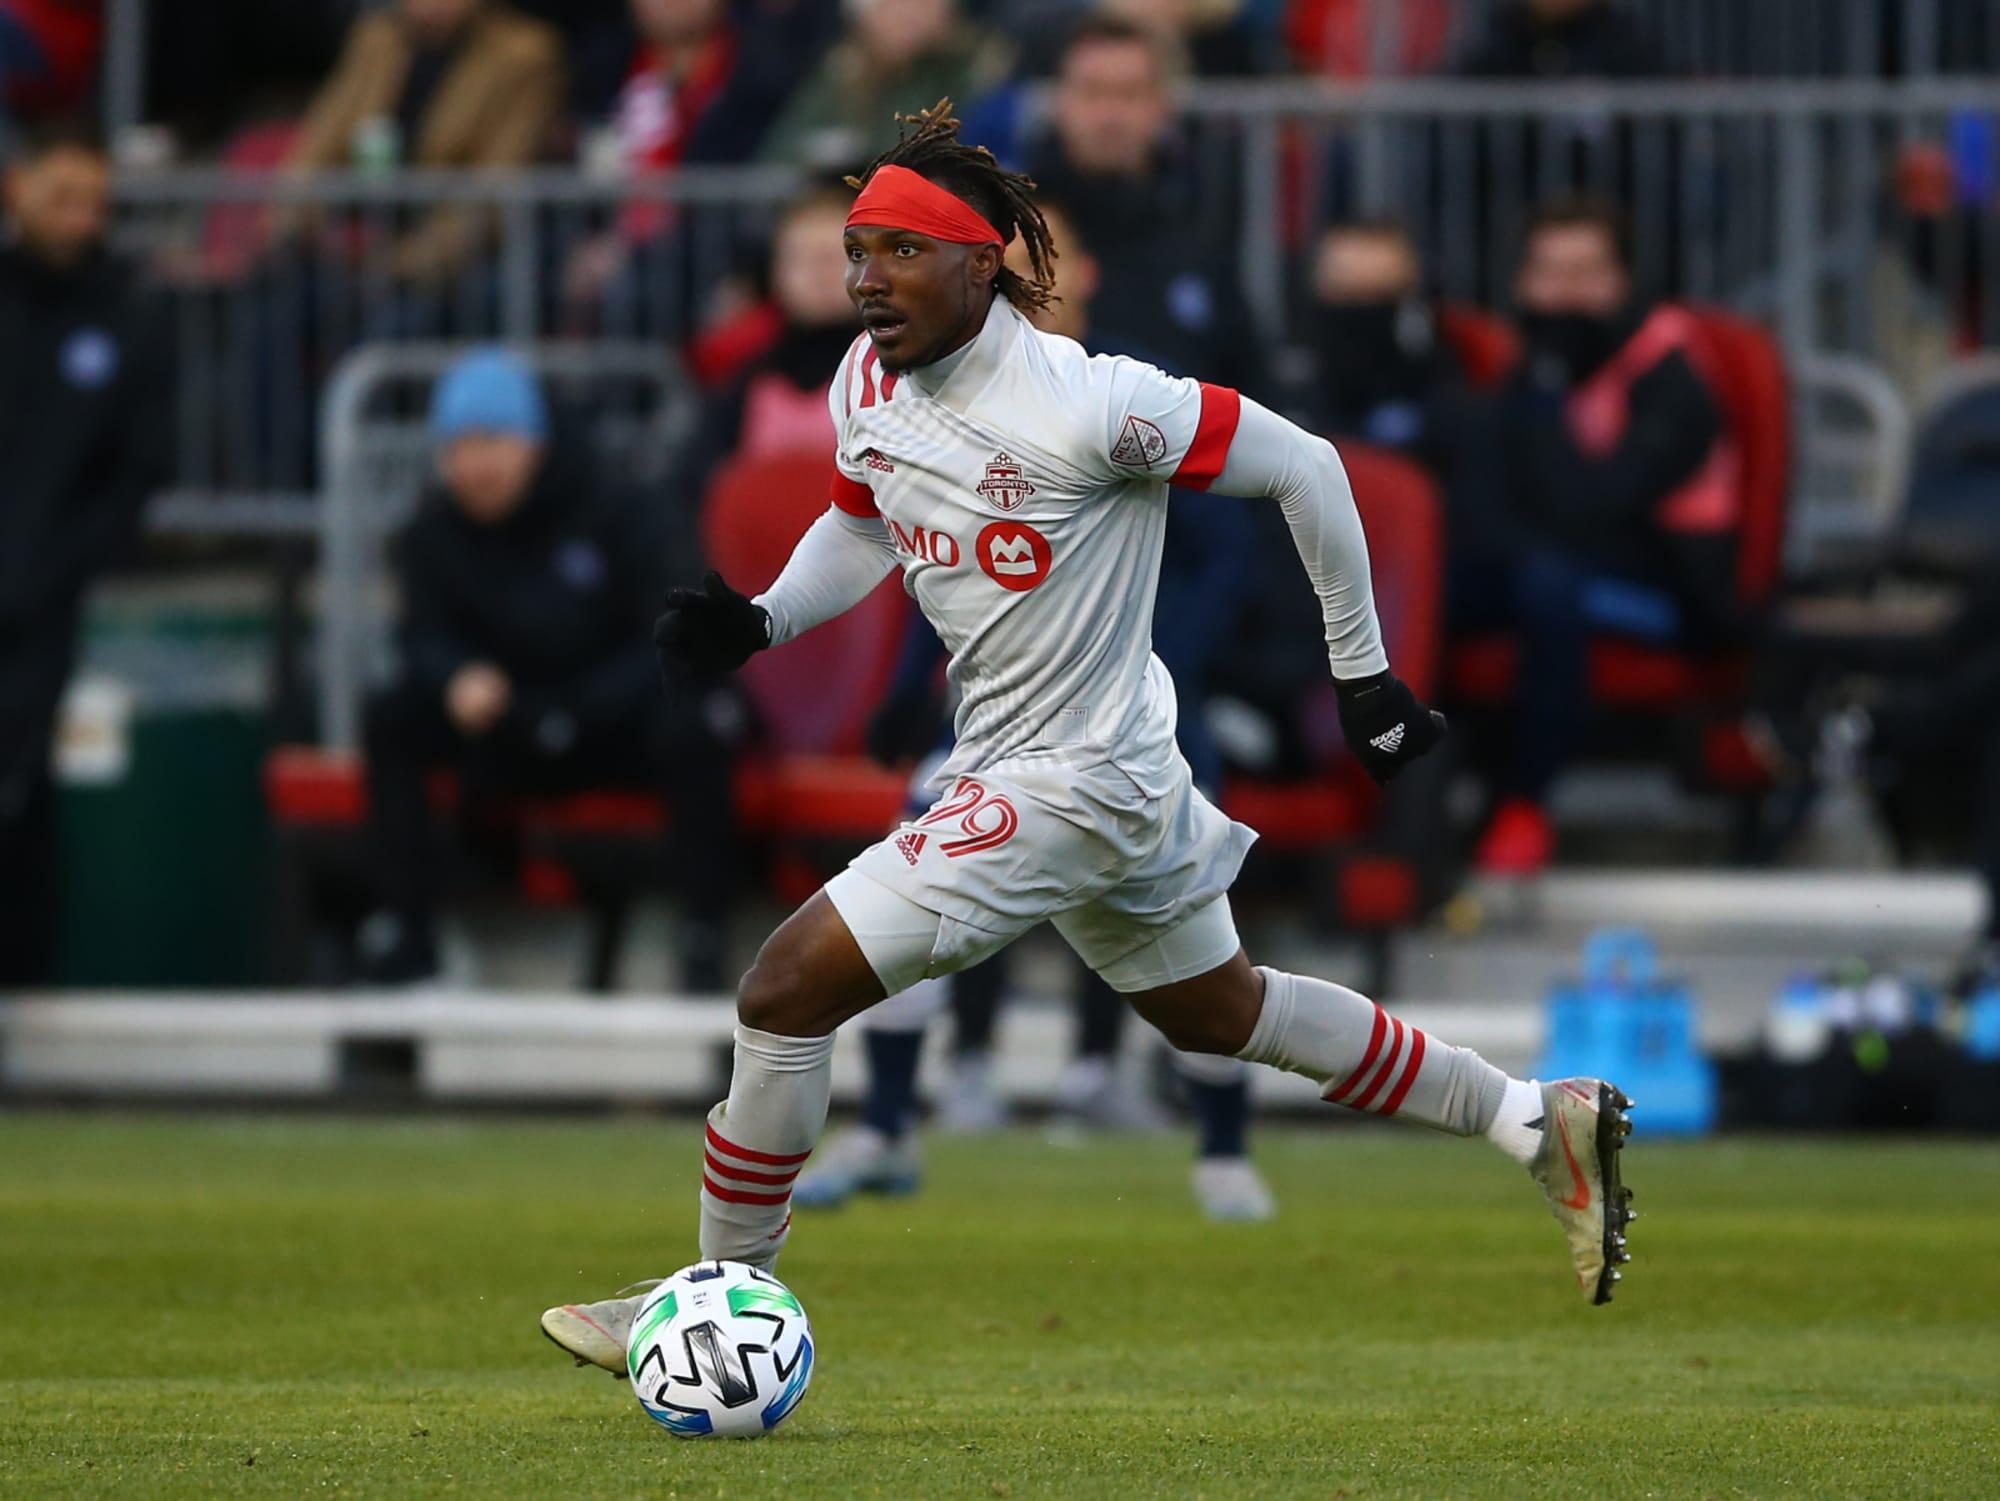 Toronto FC suffer major injury blow ahead of MLS tournament